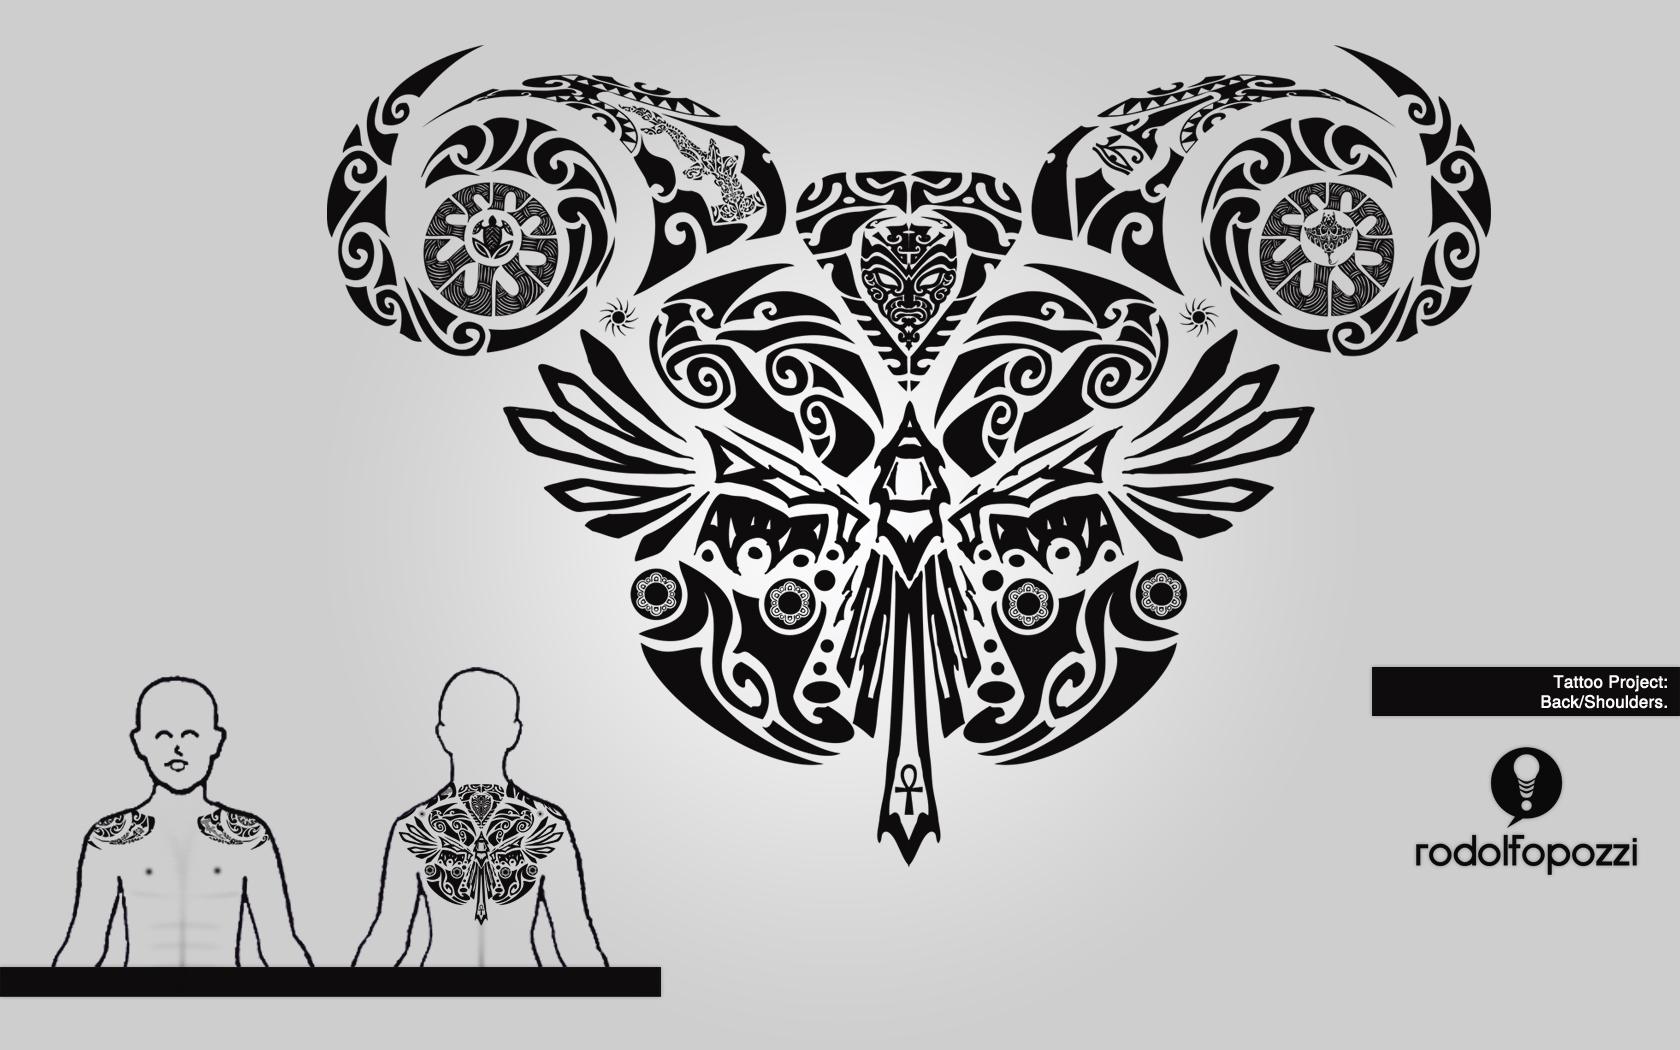 tattoo maori life by rodolfopozzi designs interfaces tattoo design ...